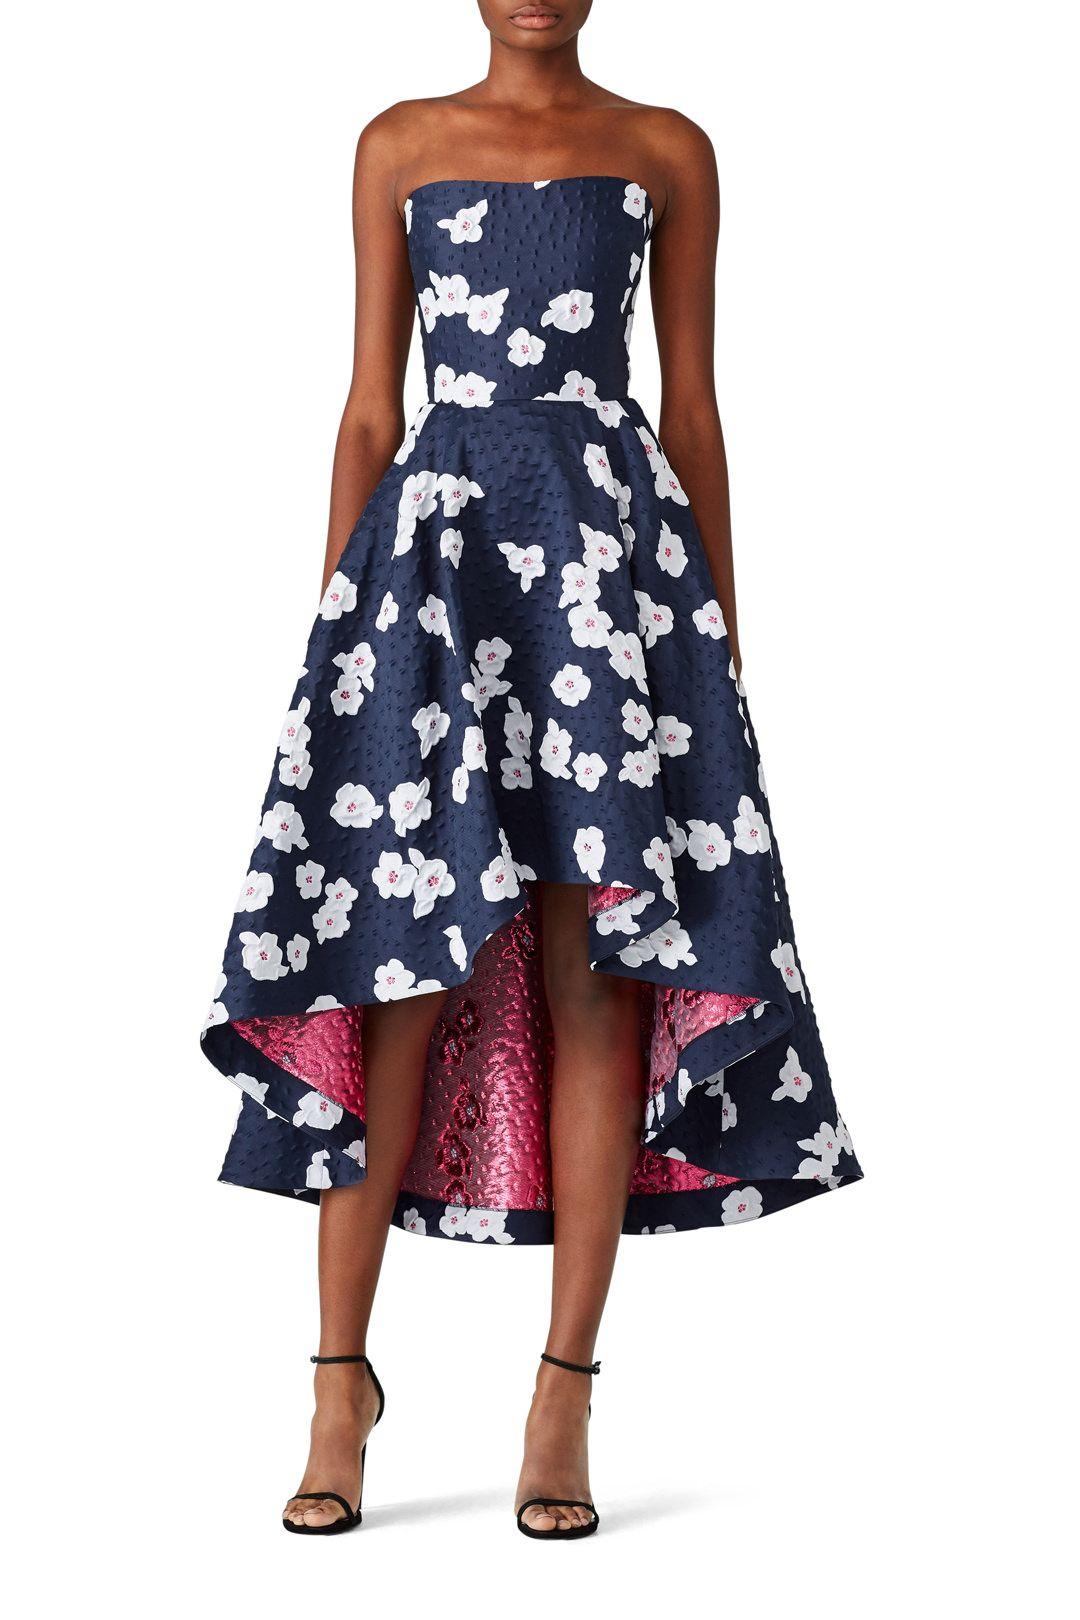 Shoshanna Paladina High Low Dress Black Tie Wedding Guest Dress Spring Wedding Guest Dress Wedding Attire Guest [ 1620 x 1080 Pixel ]